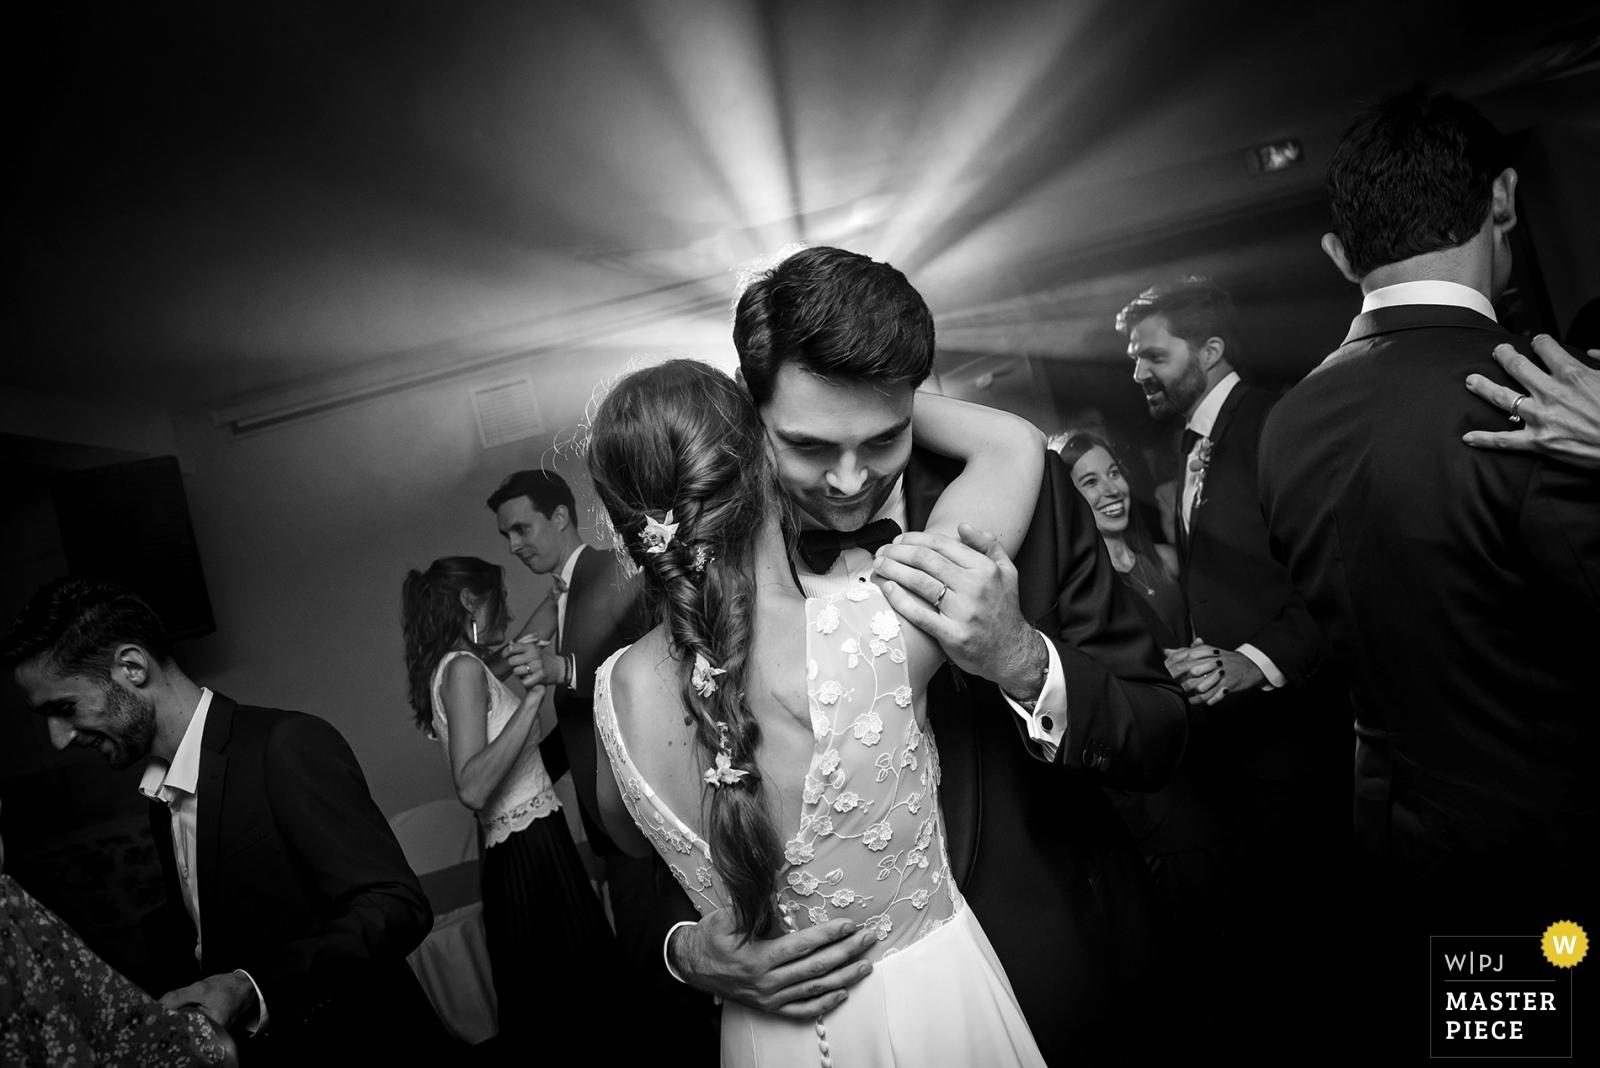 FINAL EMBRACE OF FIRST DANCE - Vertou, Nantes Wedding Photography -  | CHATEAU DE VAIR, NEAR ANCENIS, LOIRE VALLEY